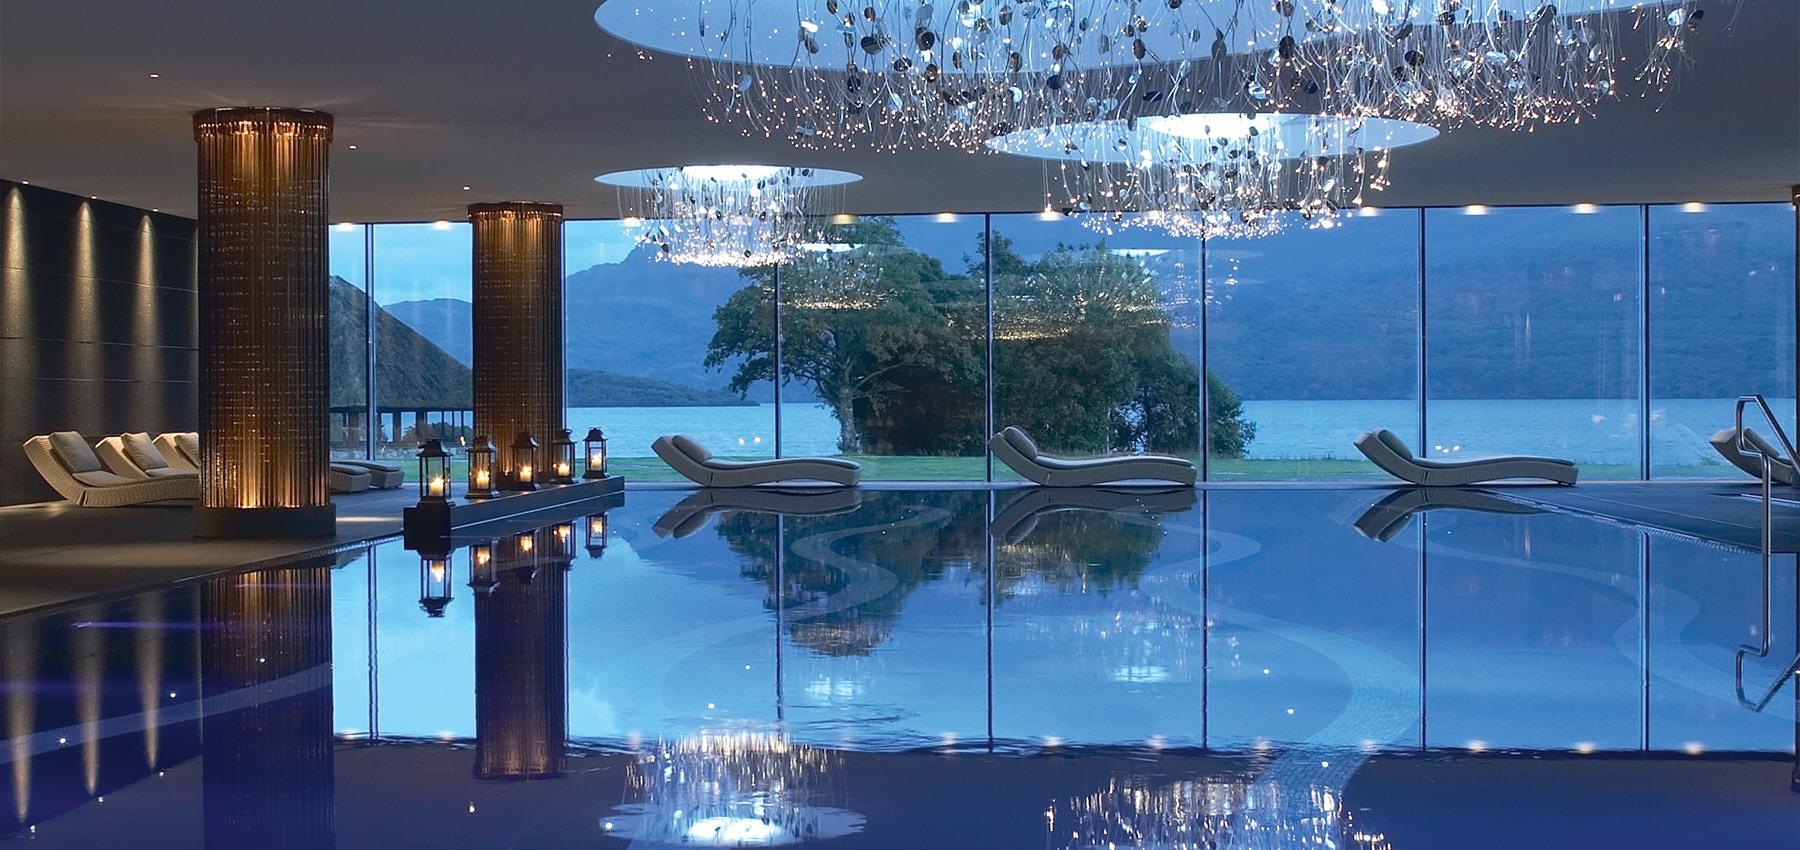 ESPA @ Hotel Europe